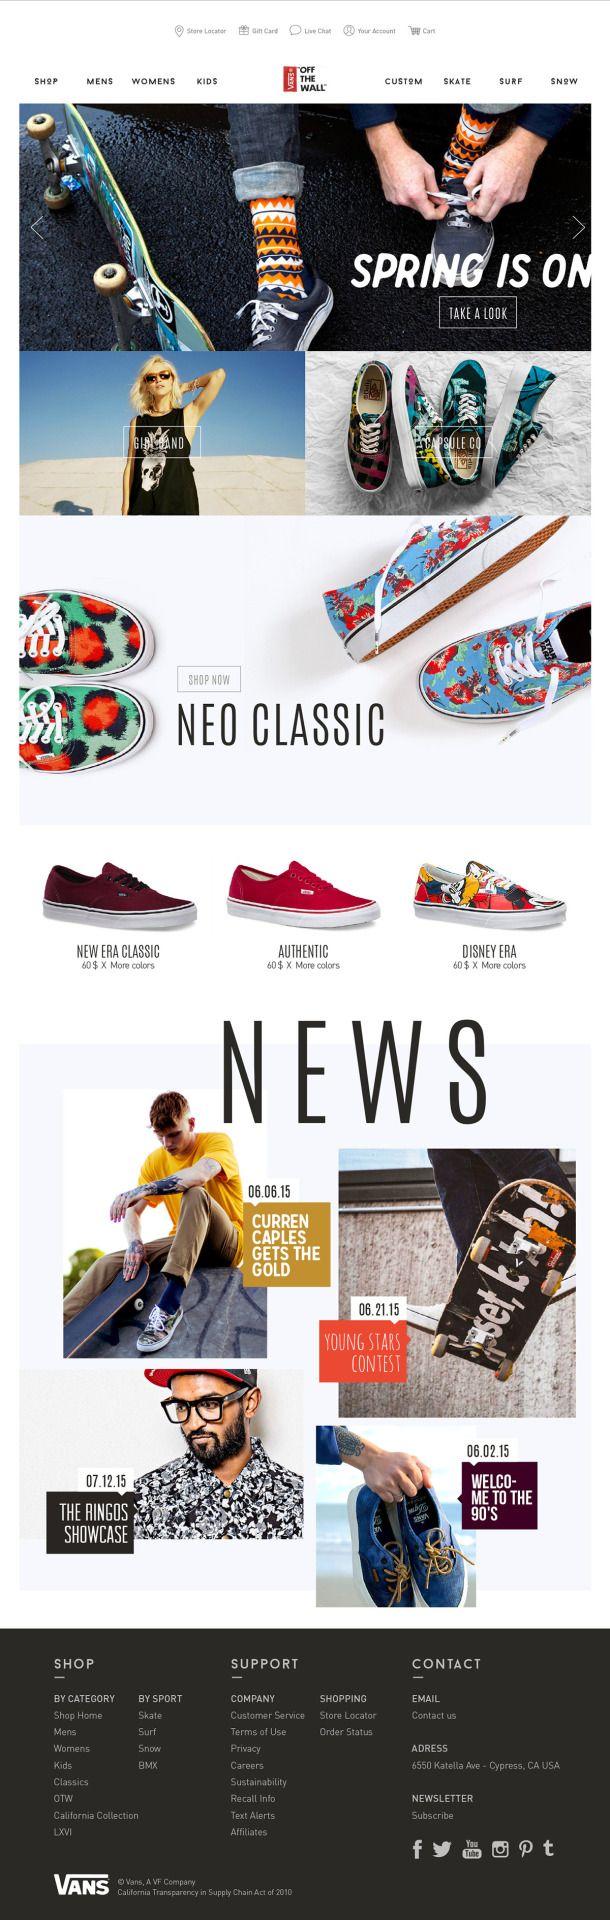 New Design concept for Vans website